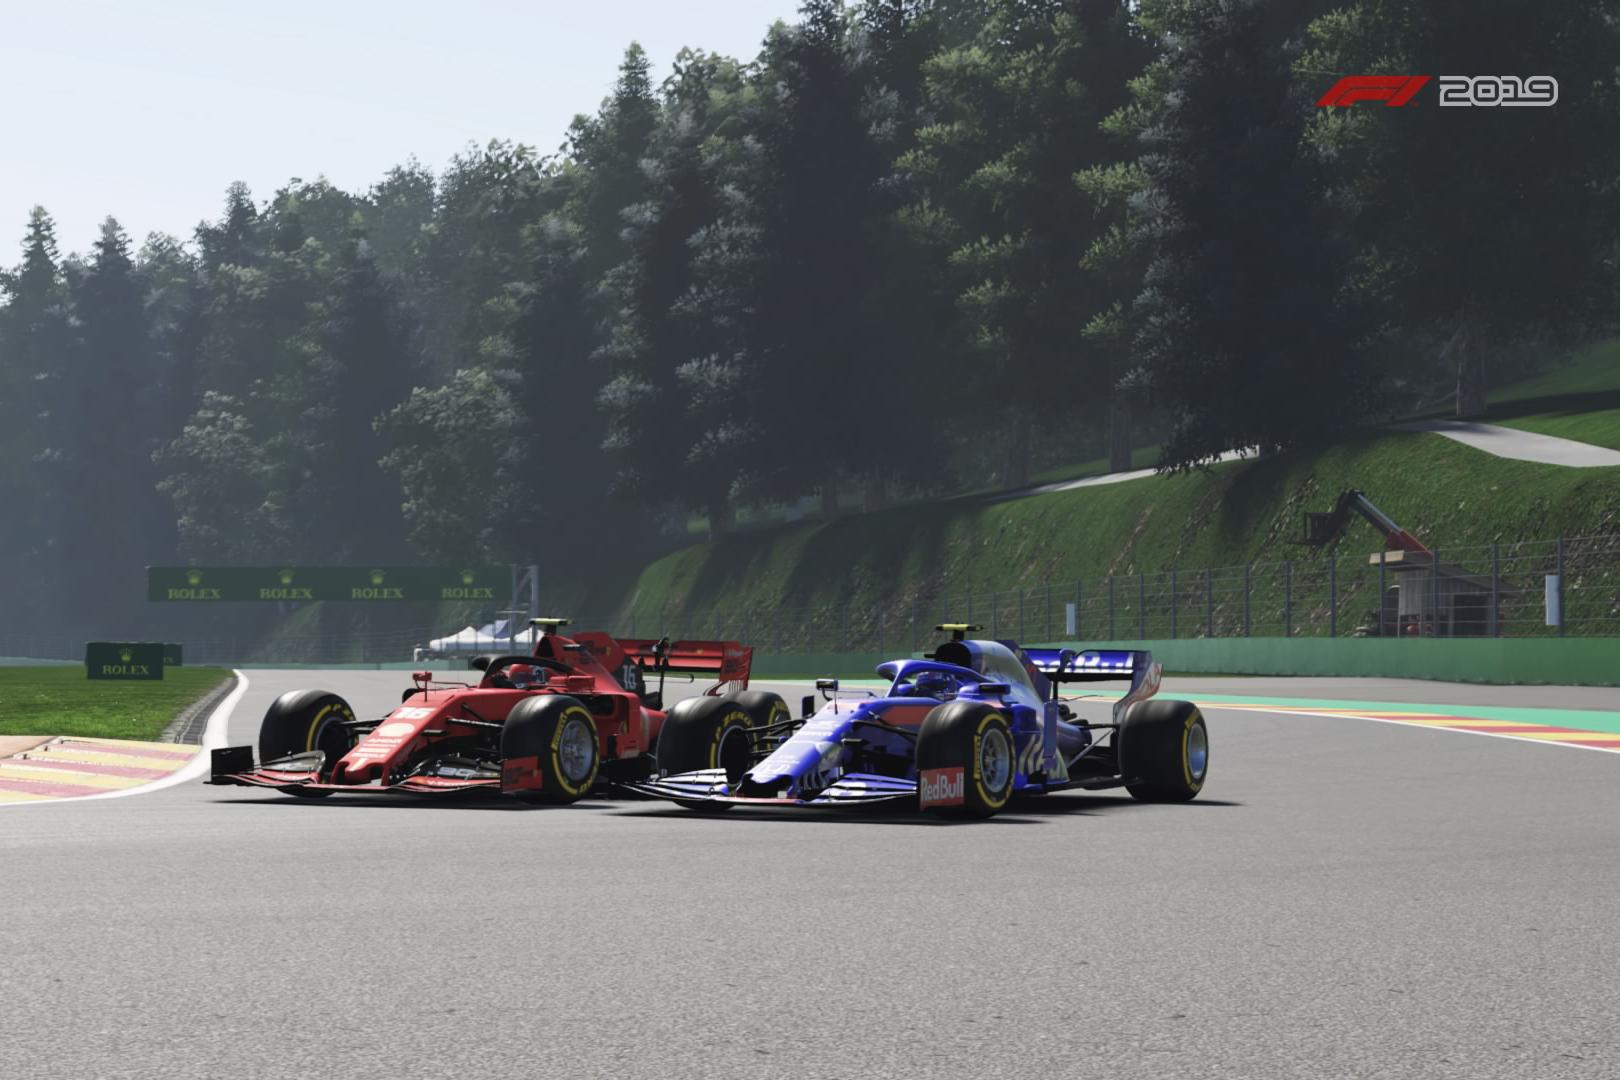 Esports aces Bolukbasi and Bereznay beat F1 stars in NotTheGP